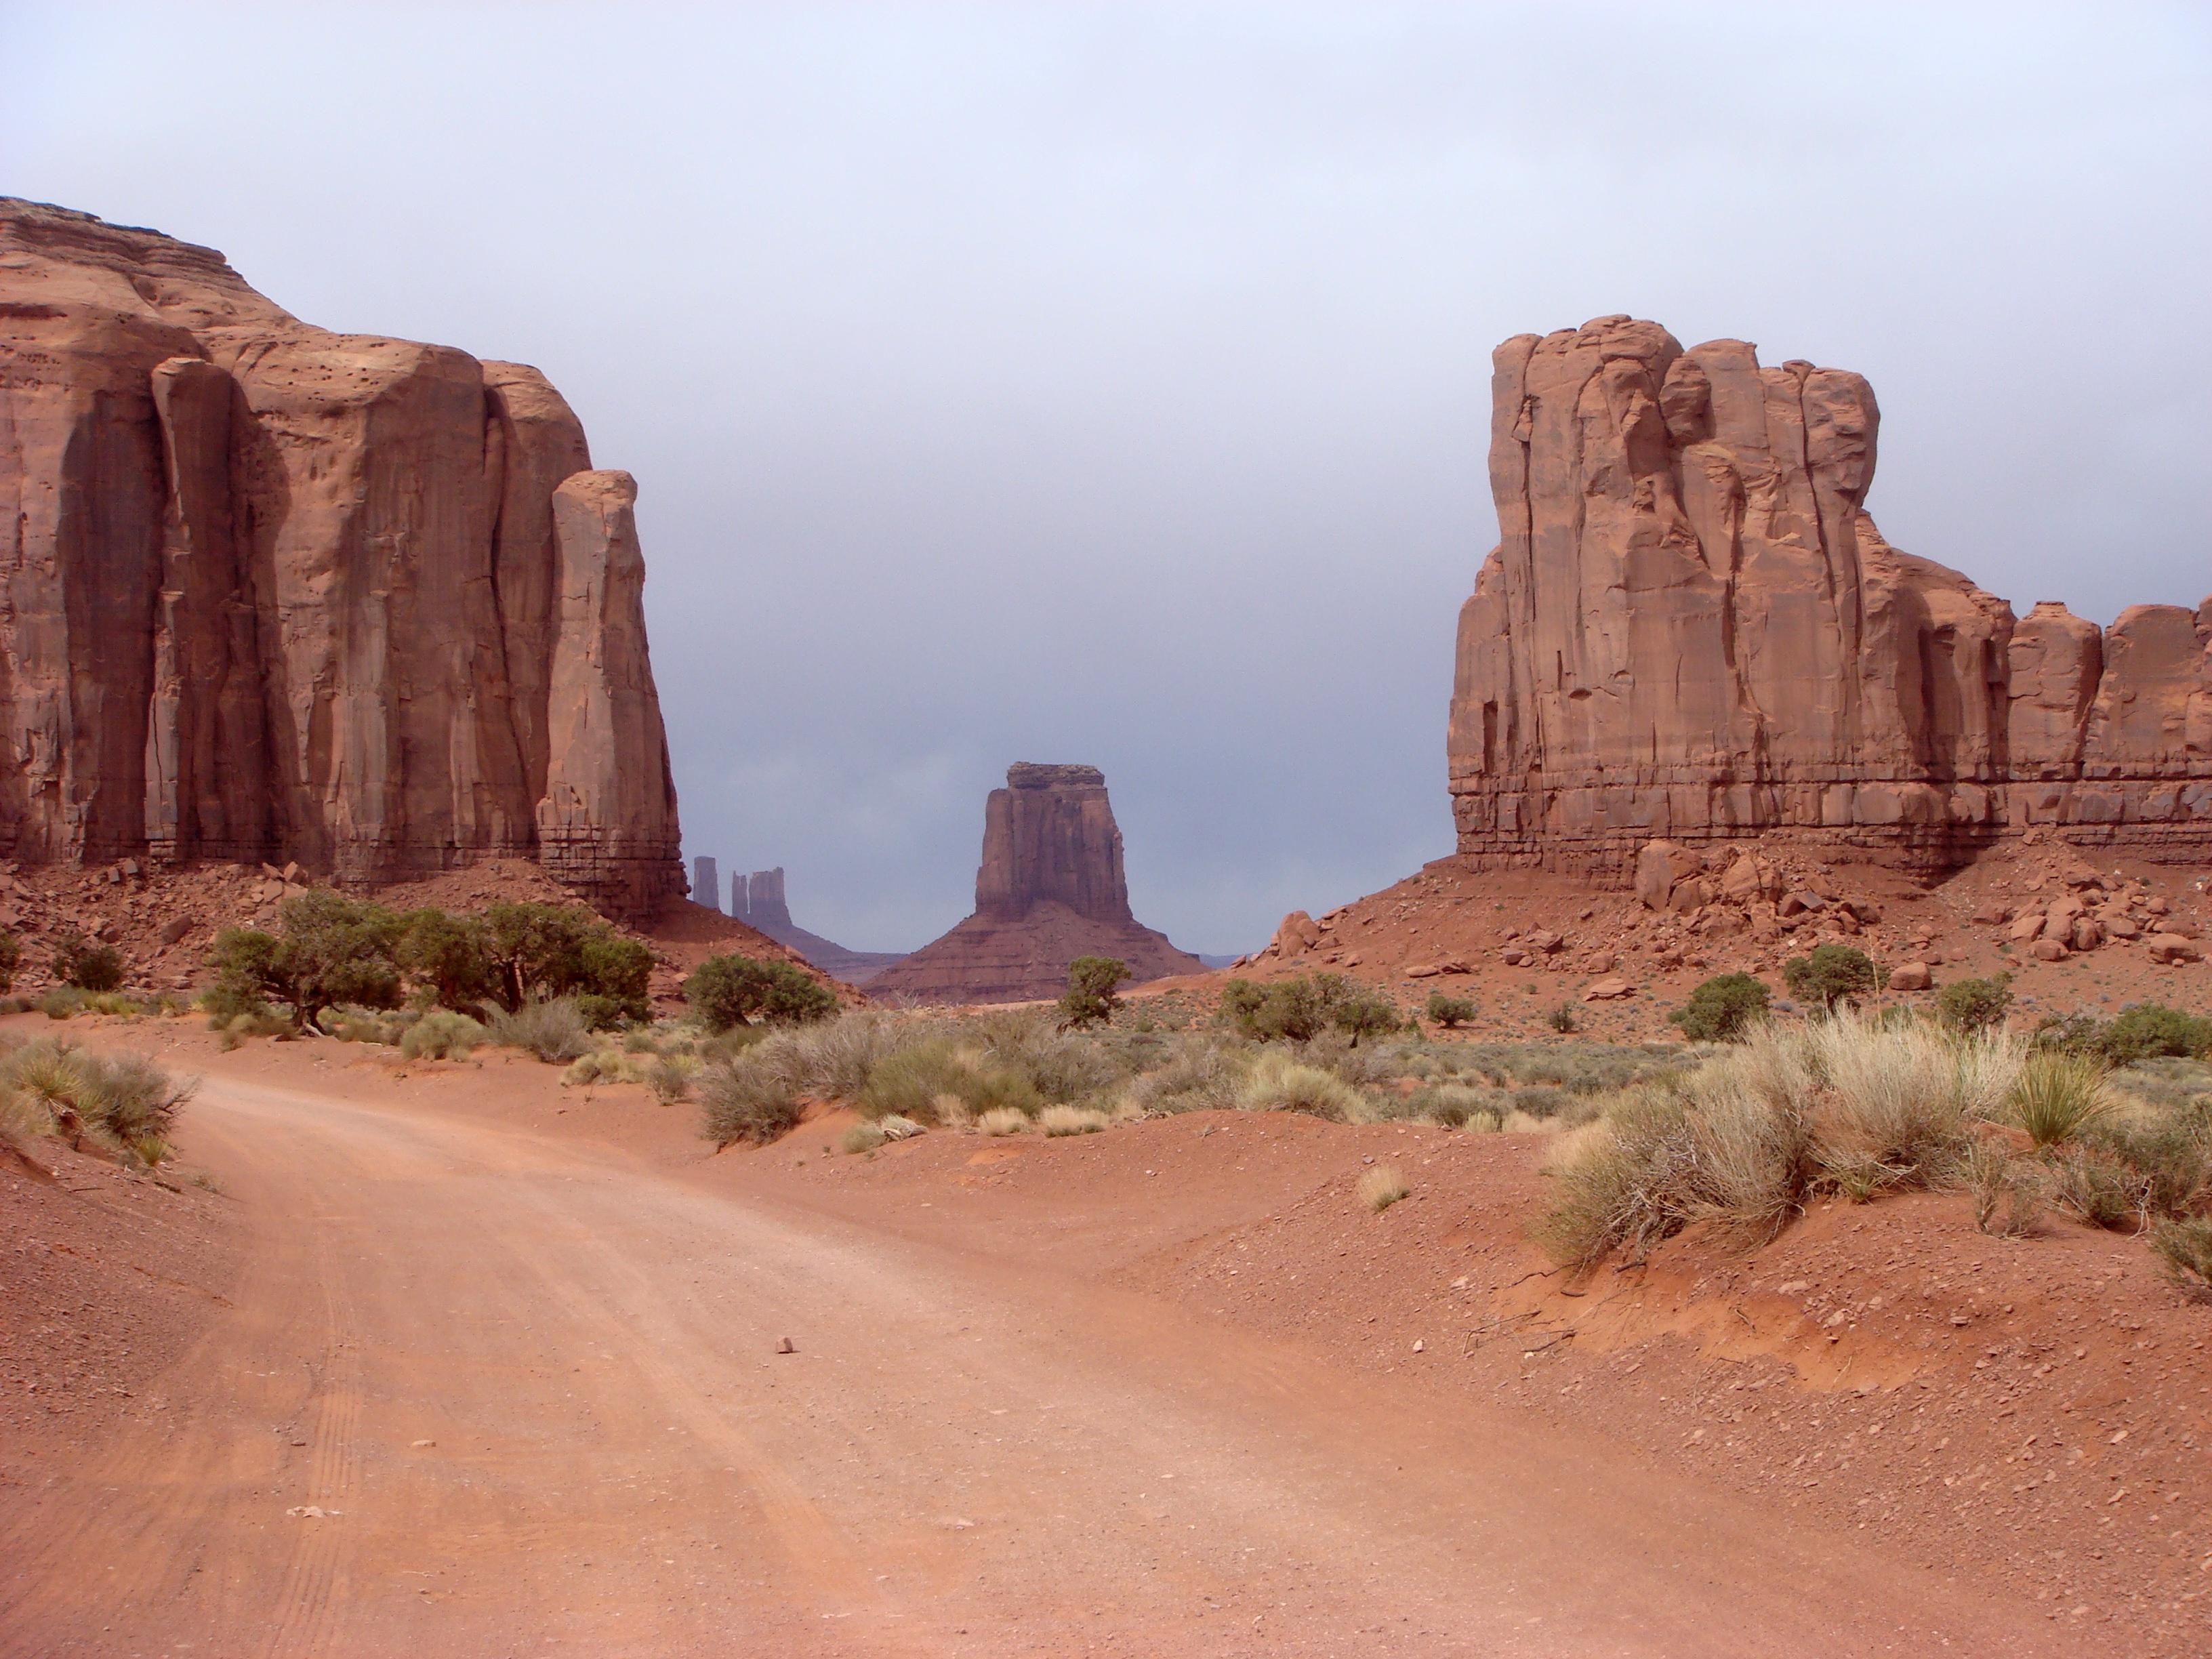 Free Images : landscape, nature, architecture, desert ...